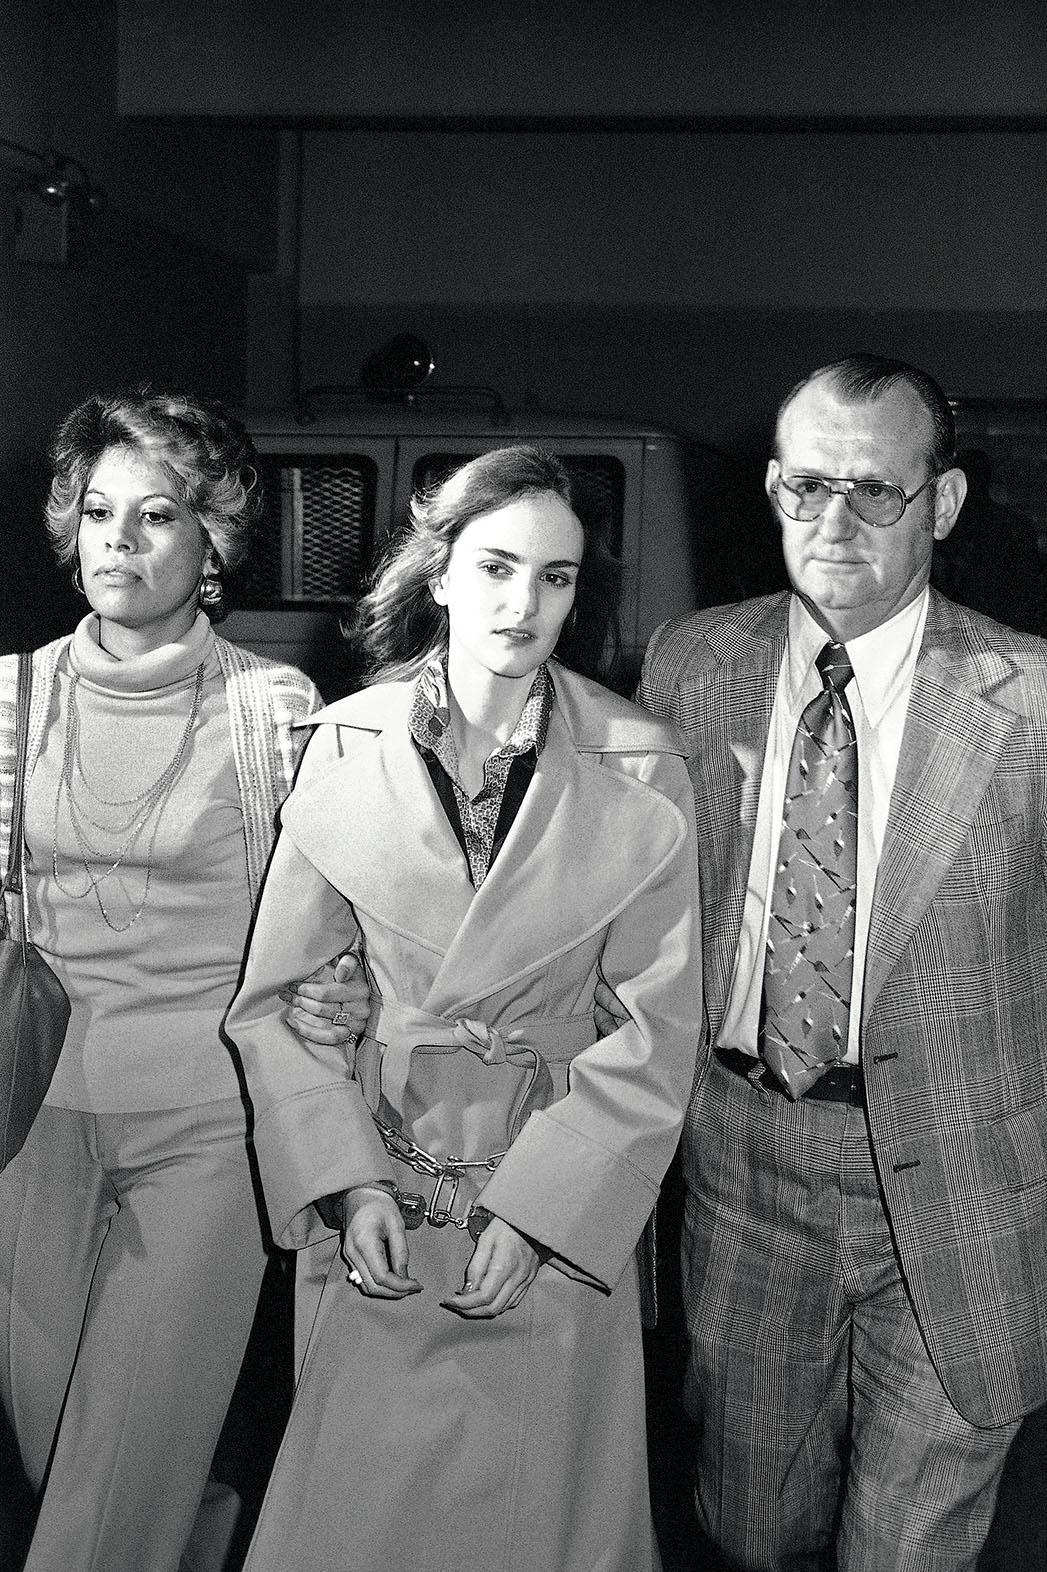 Patricia Hearst Crime Spree Ended - P 2015